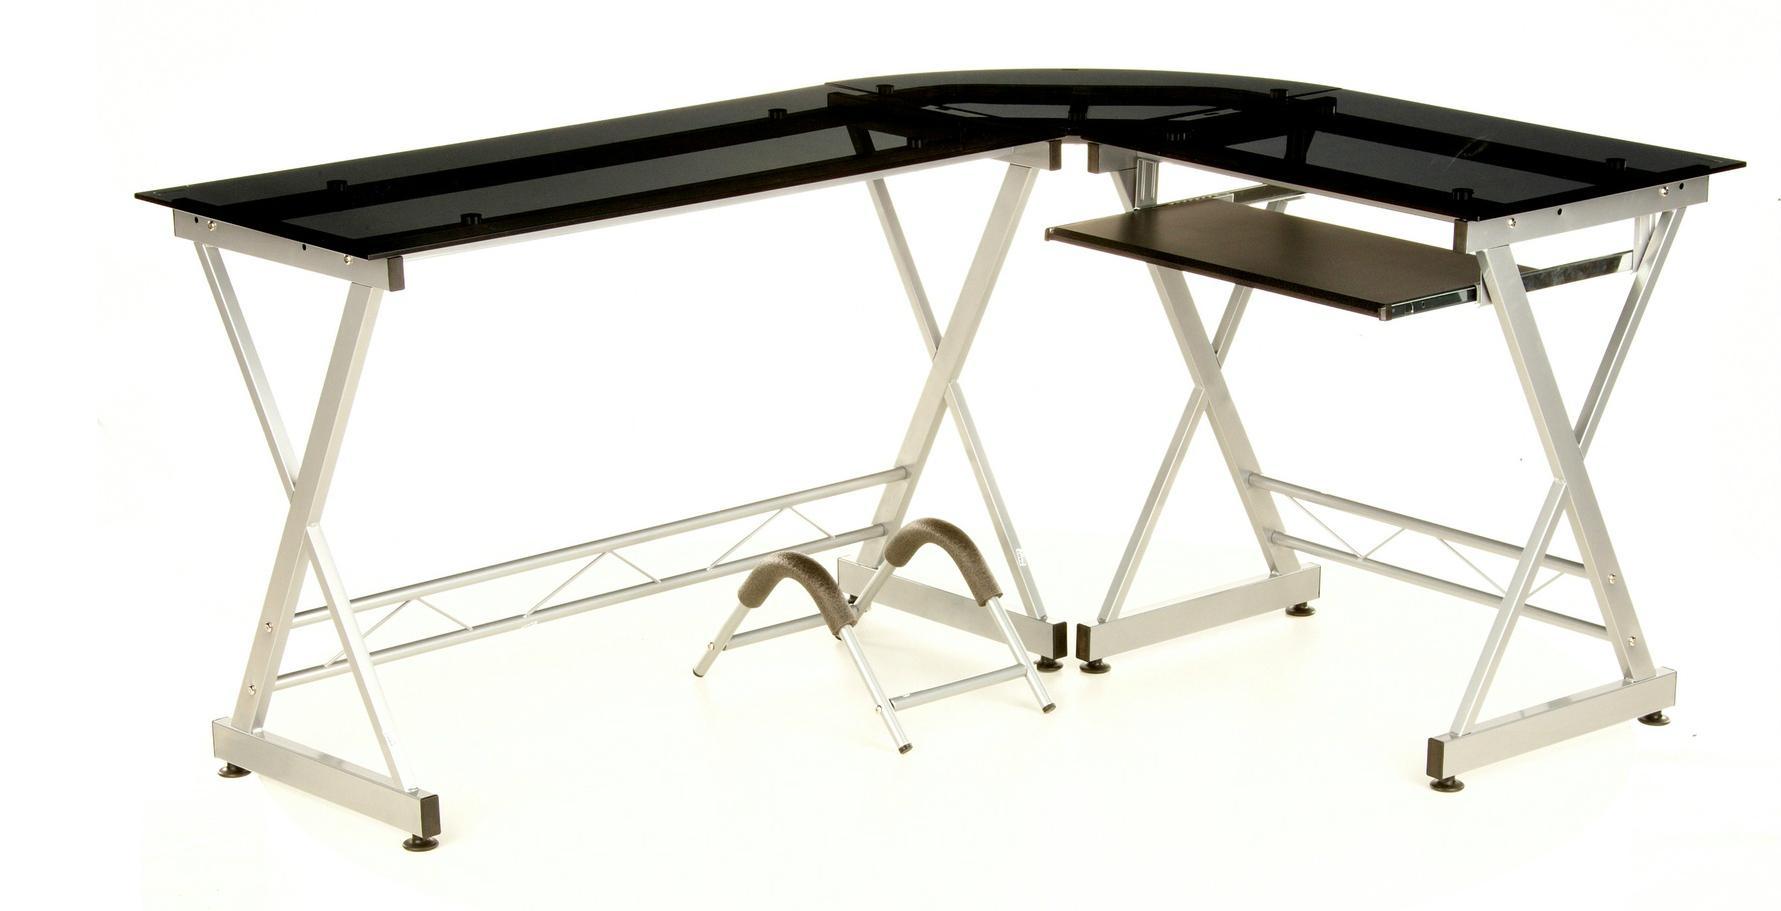 Mesa de Oficina en Cristal templado Negro muy amplio EXPERT, diseño  moderno, con soporte PC, 75 x 160 cm